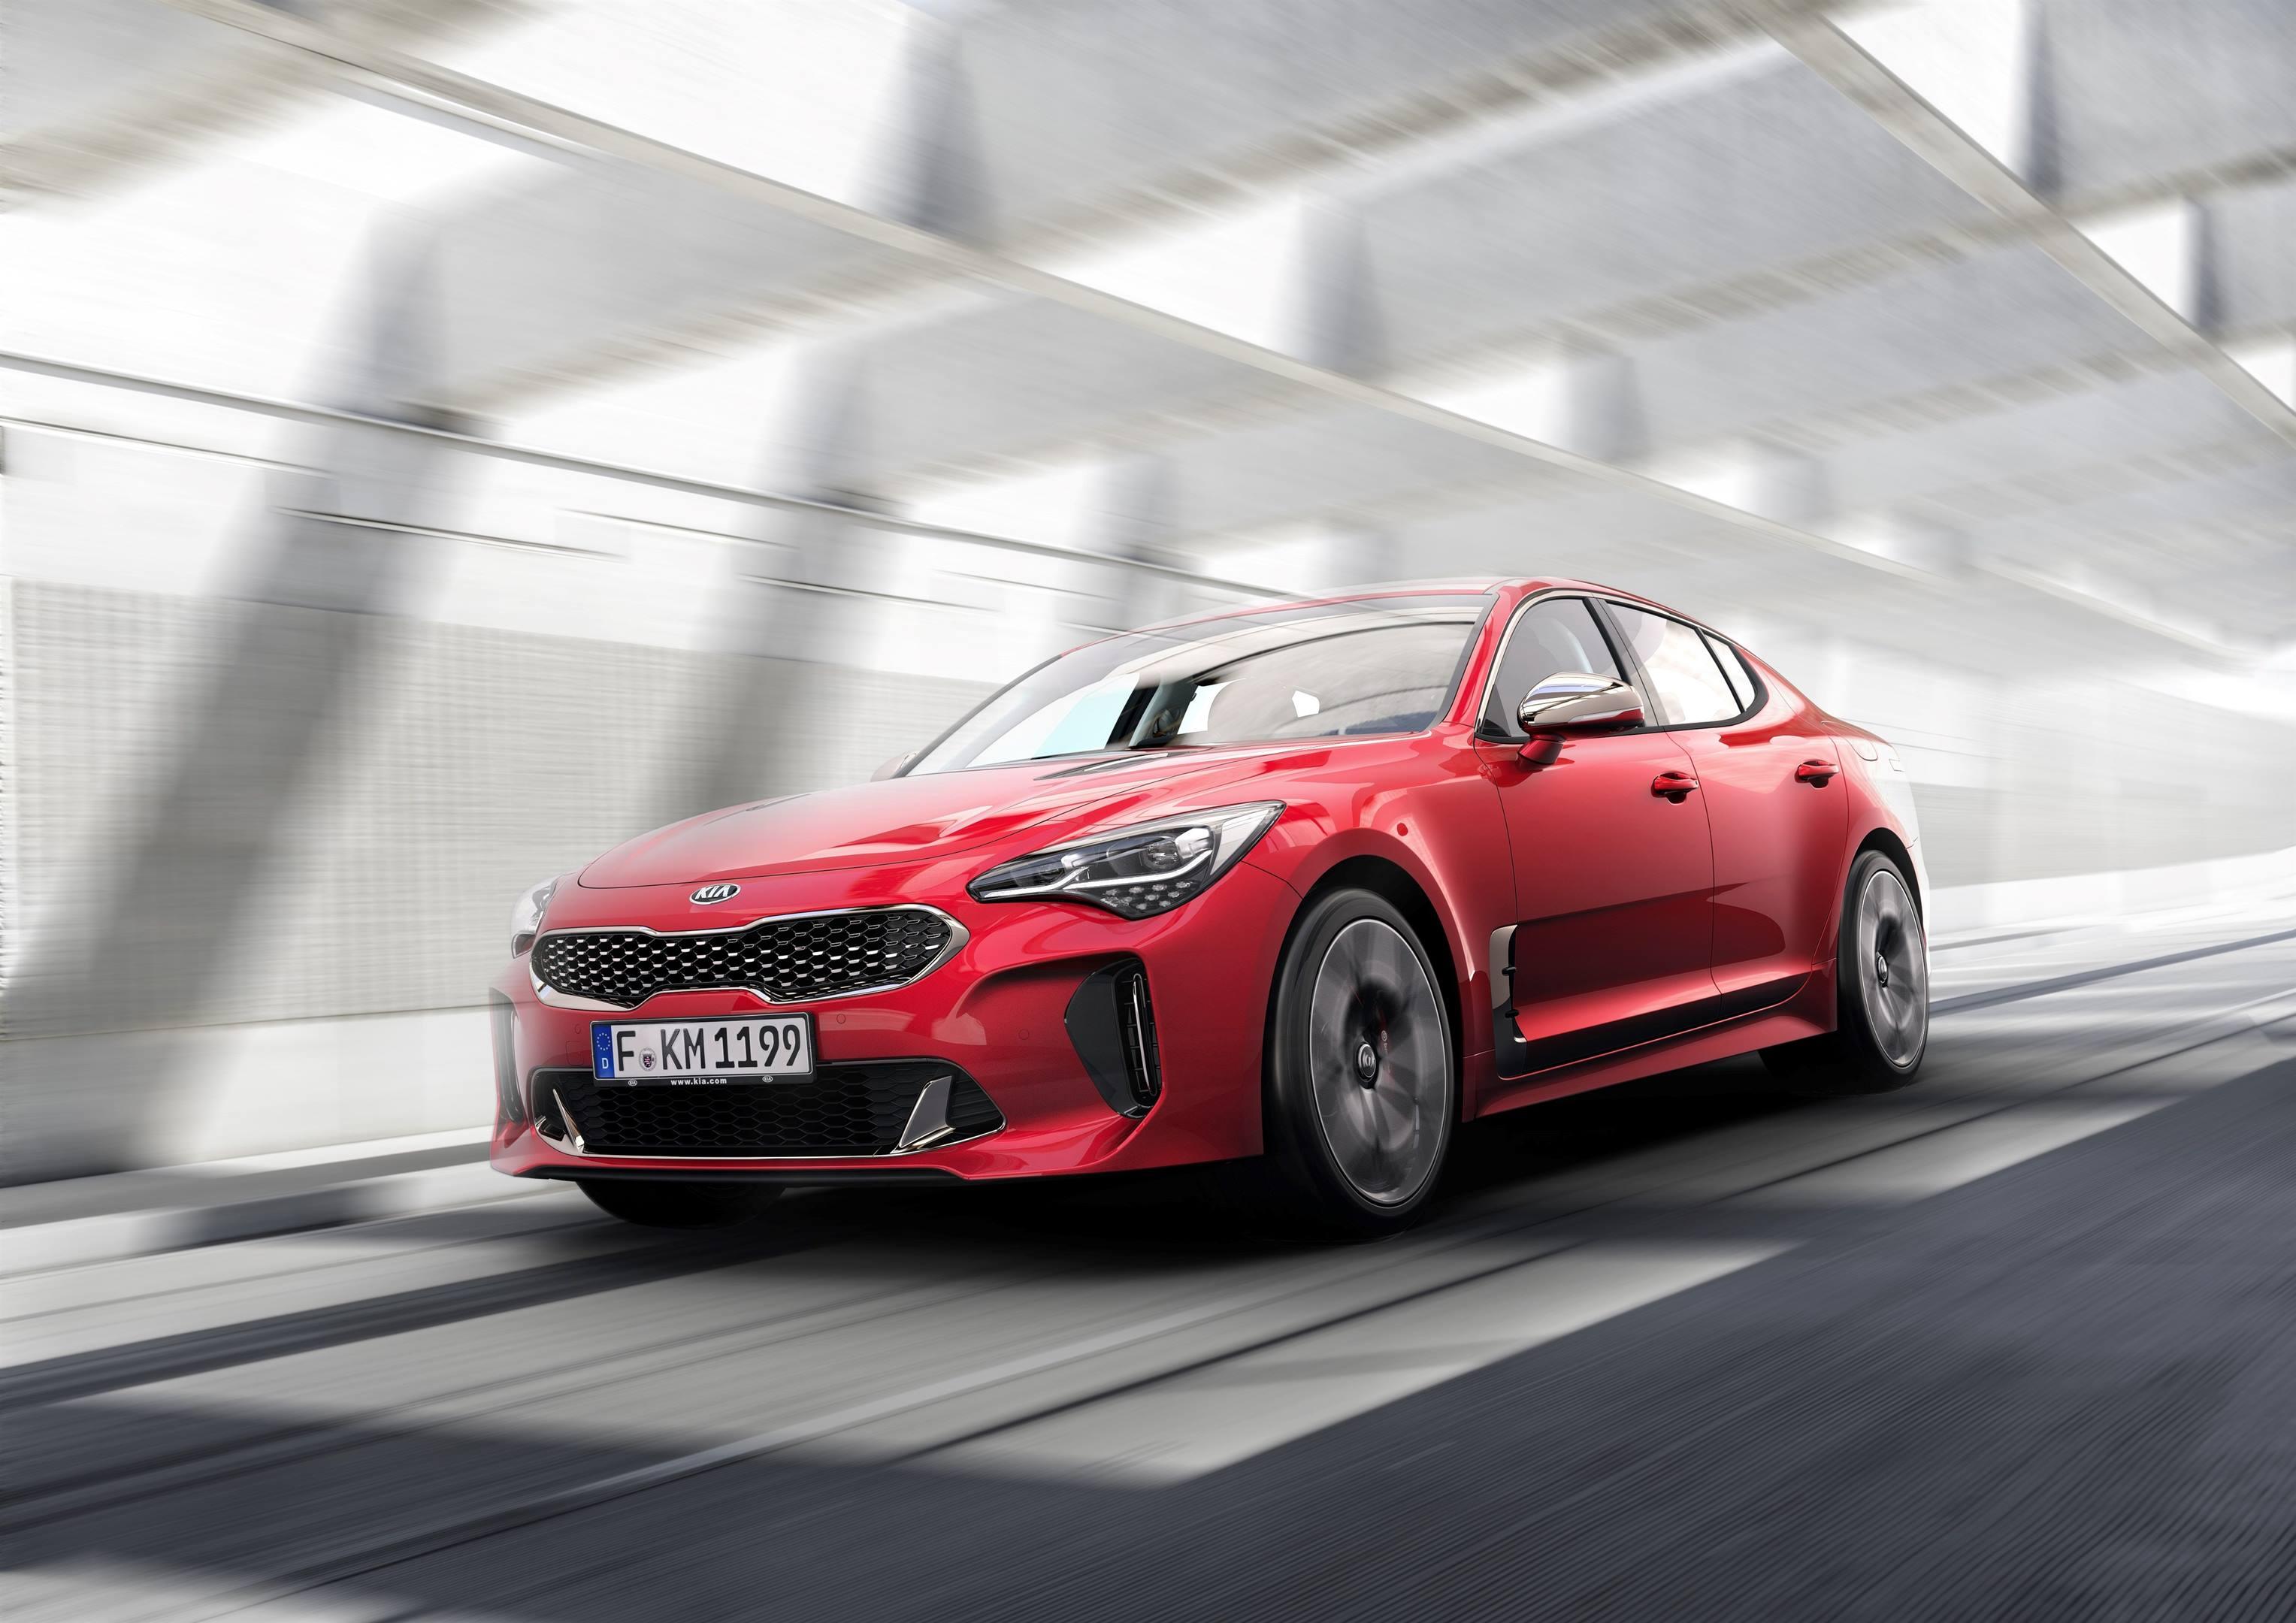 2018 Kia Stinger GT driving